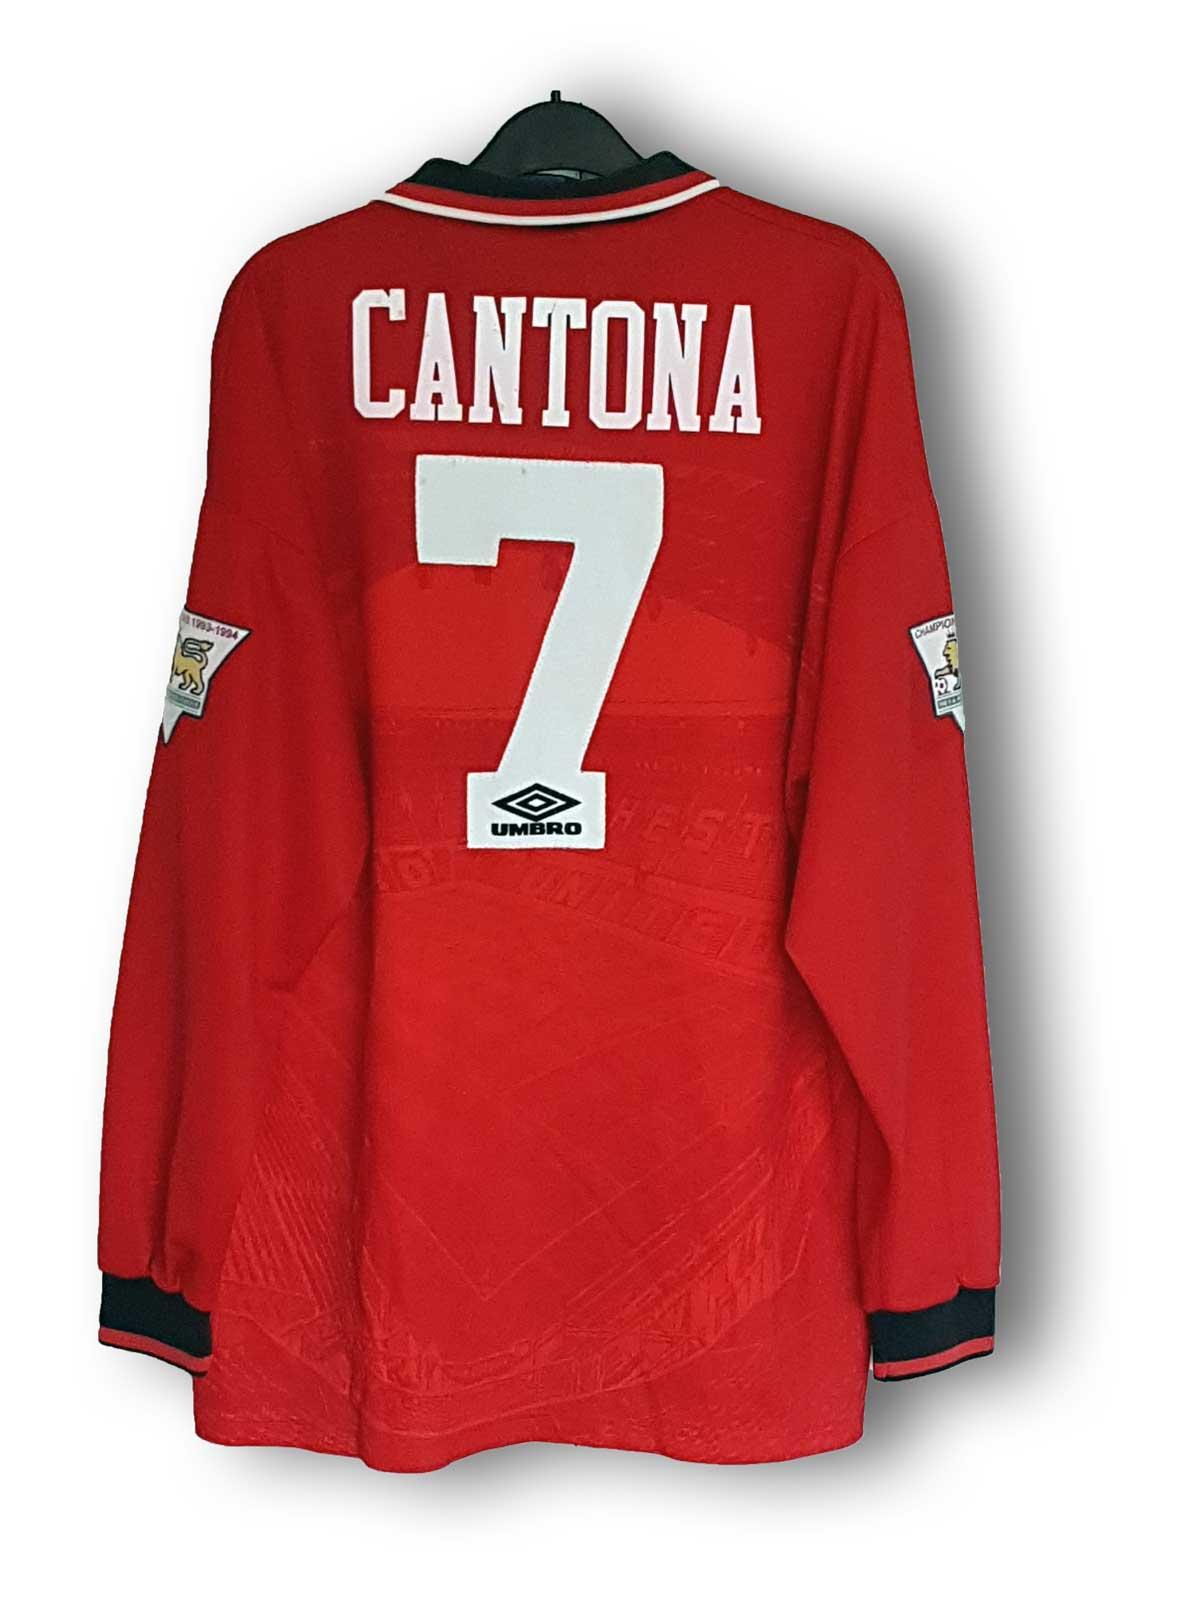 4da8f9341a5 Eric Cantona 1994 95. Red home shirt No 7  Match worn  Manufactured by ...